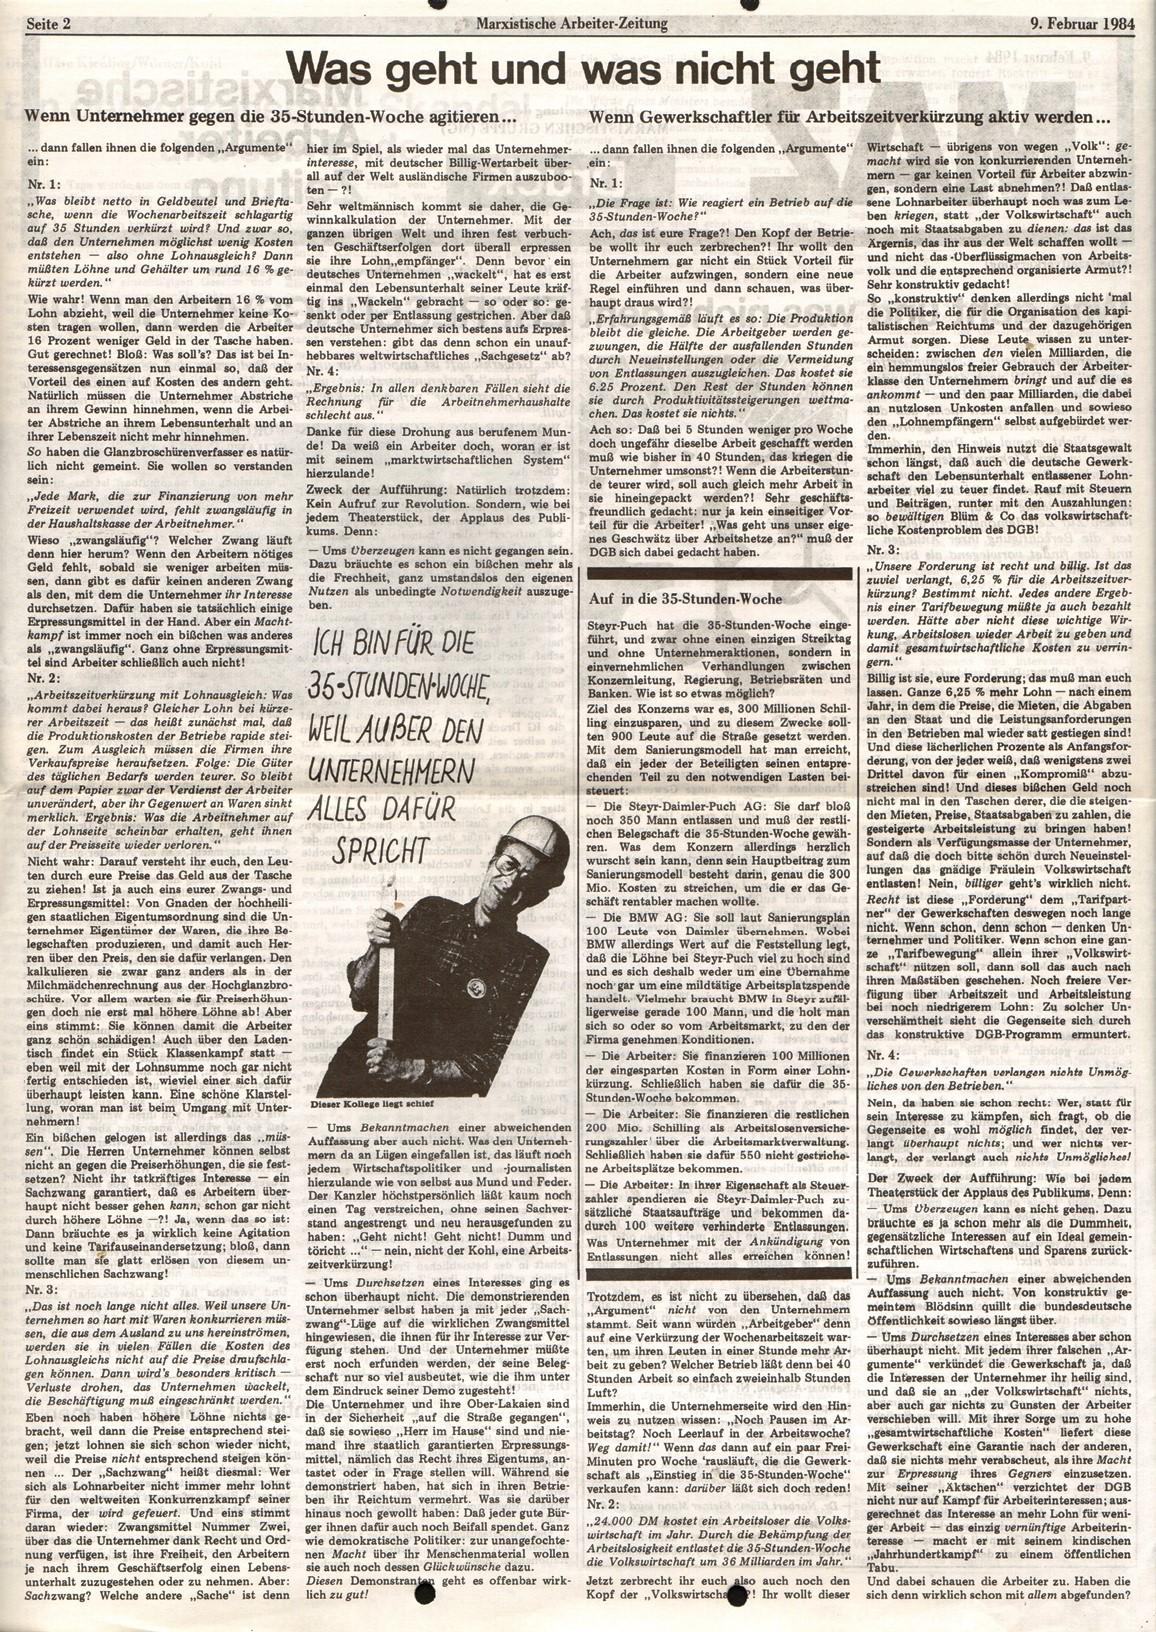 Muenchen_MG_MAZ_Druck_19840209_02